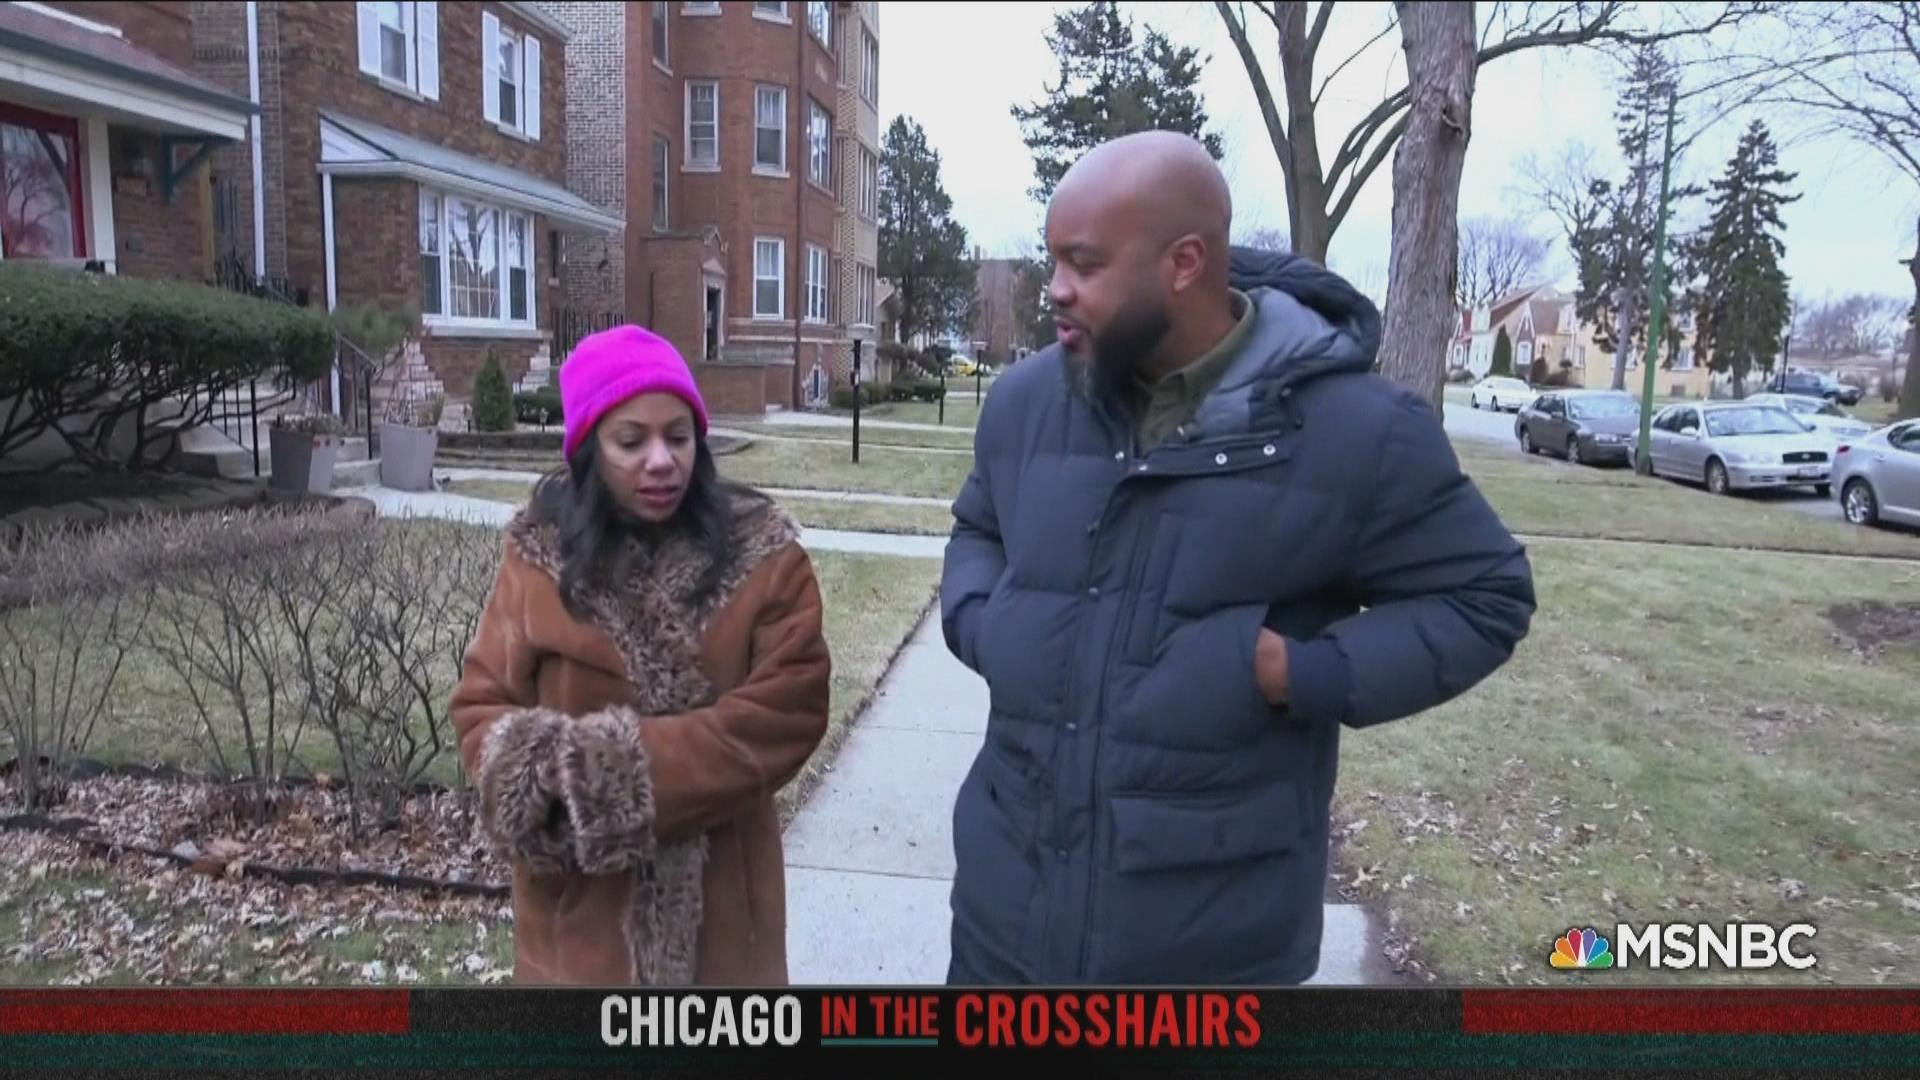 Segregation in Chicago